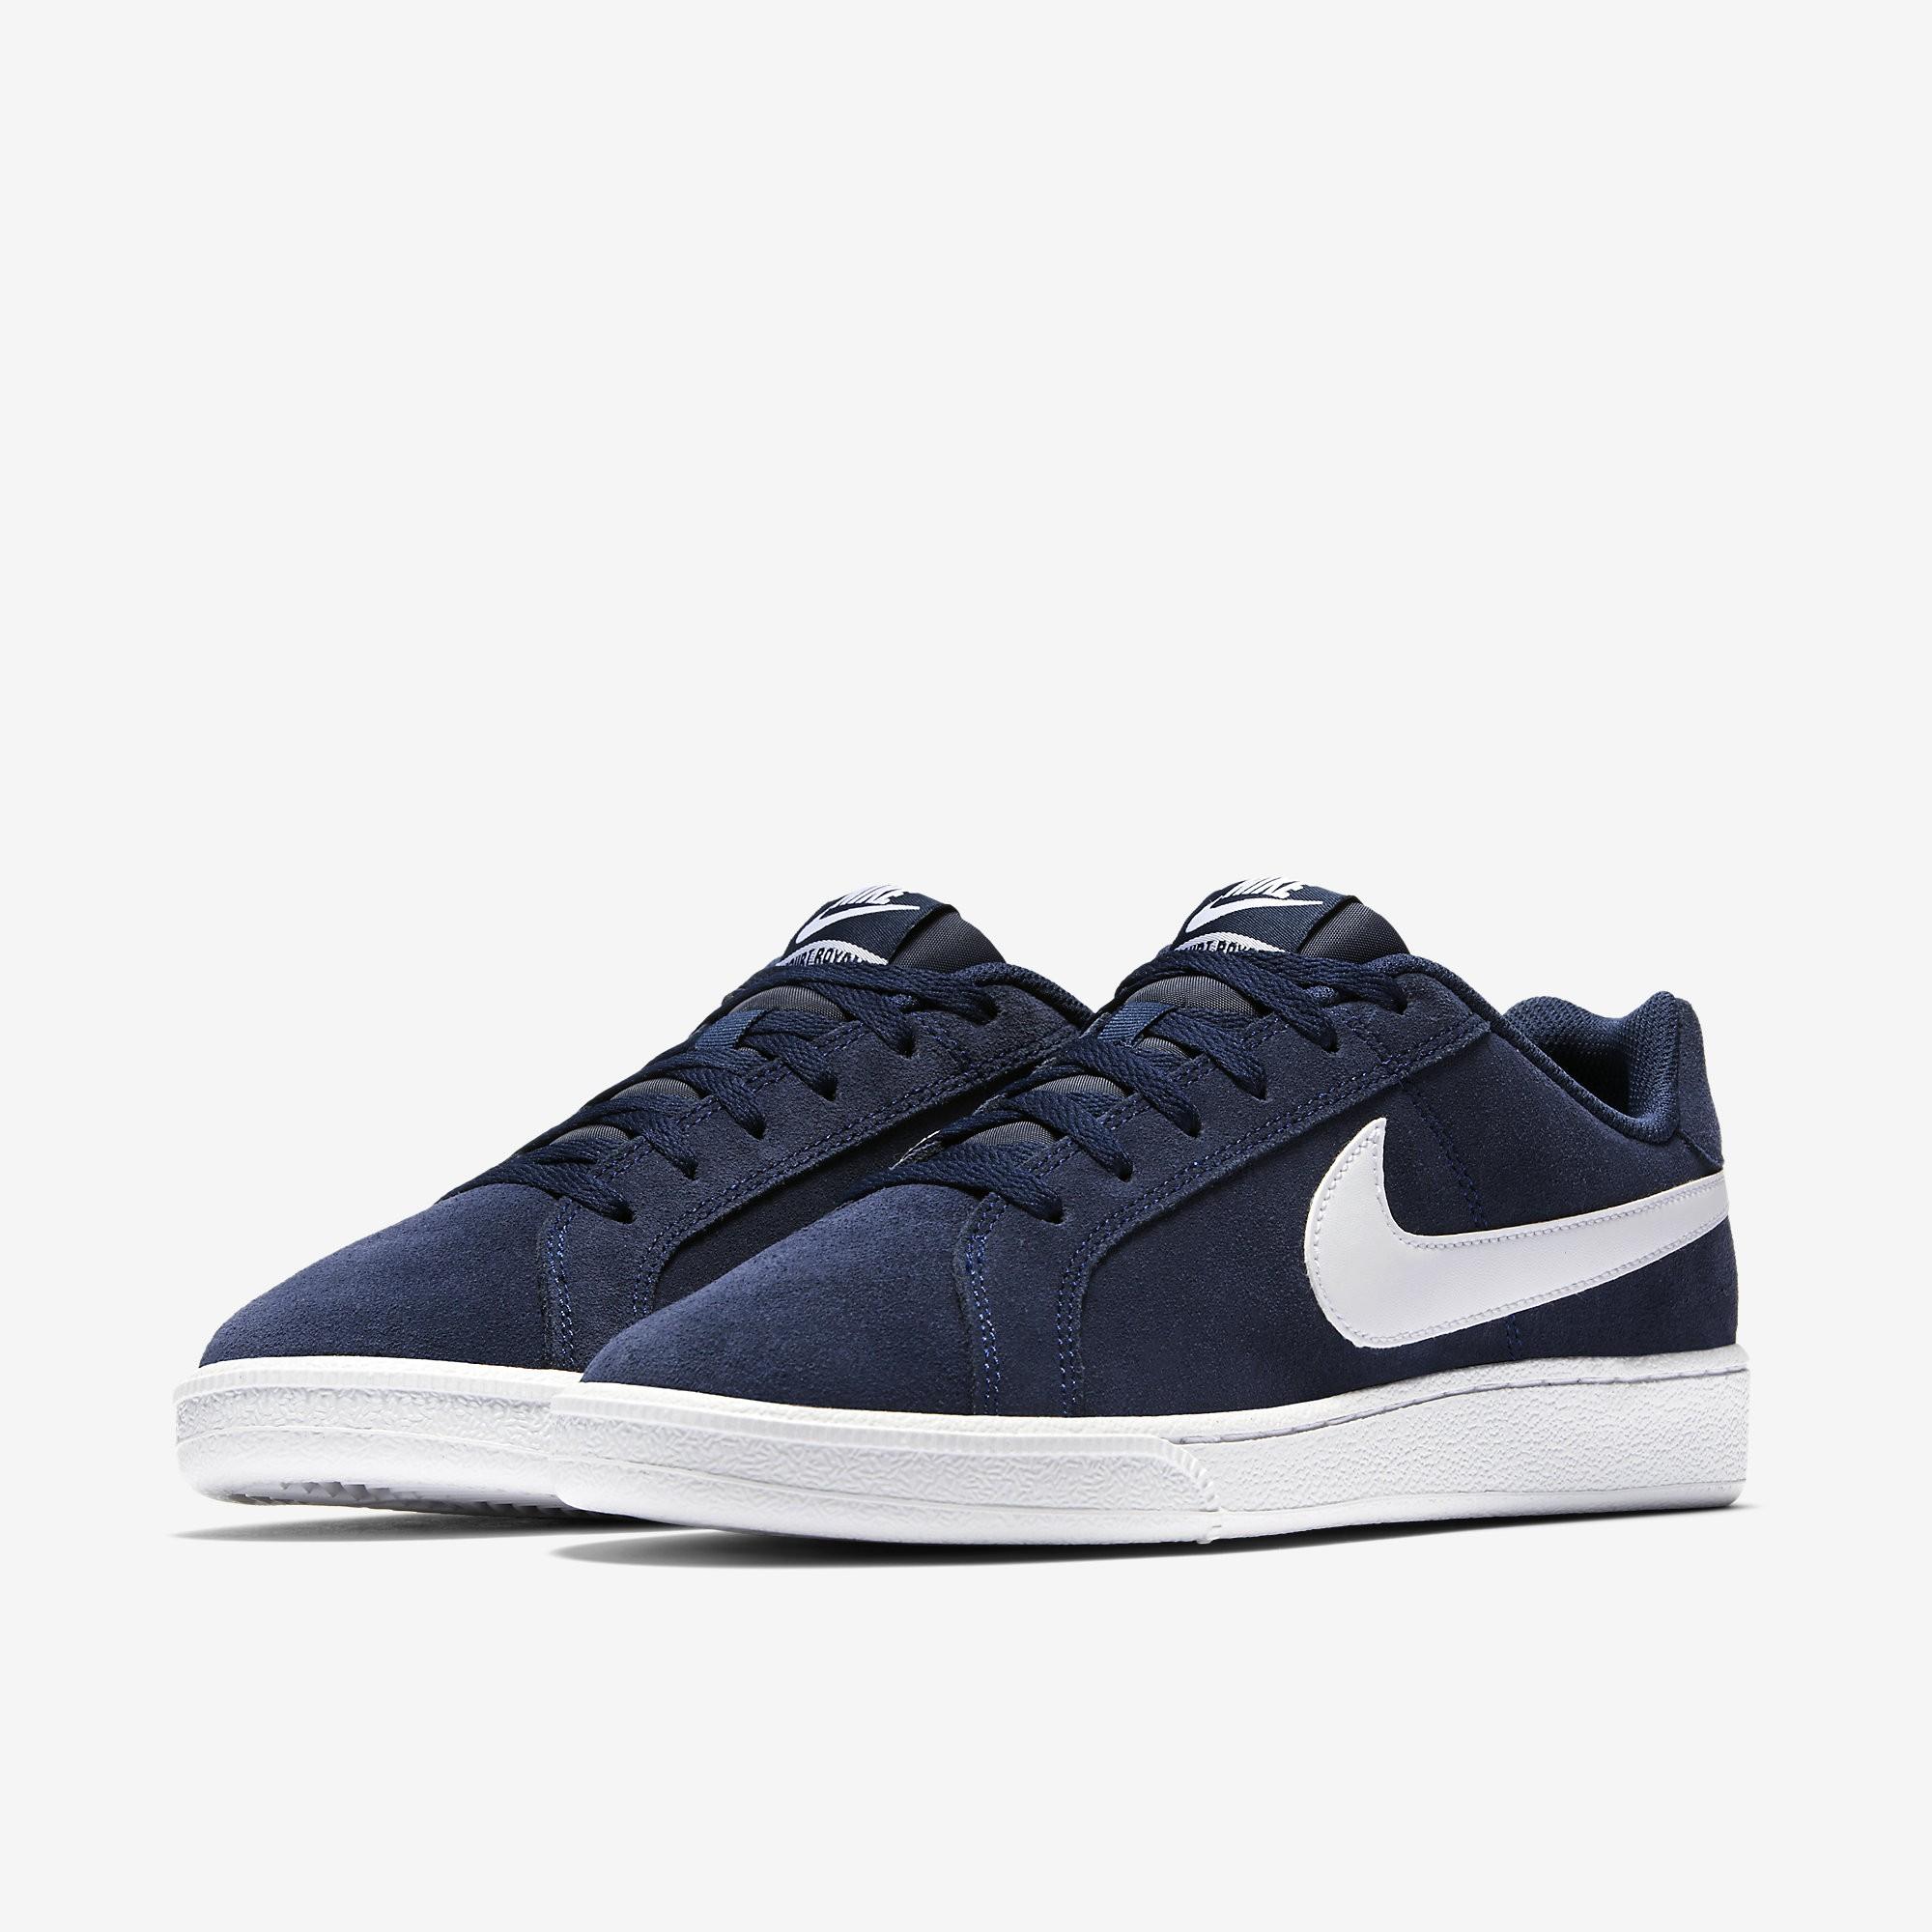 Zapatillas Tenis Nike Court Royale Suede 819802 410 BLACK